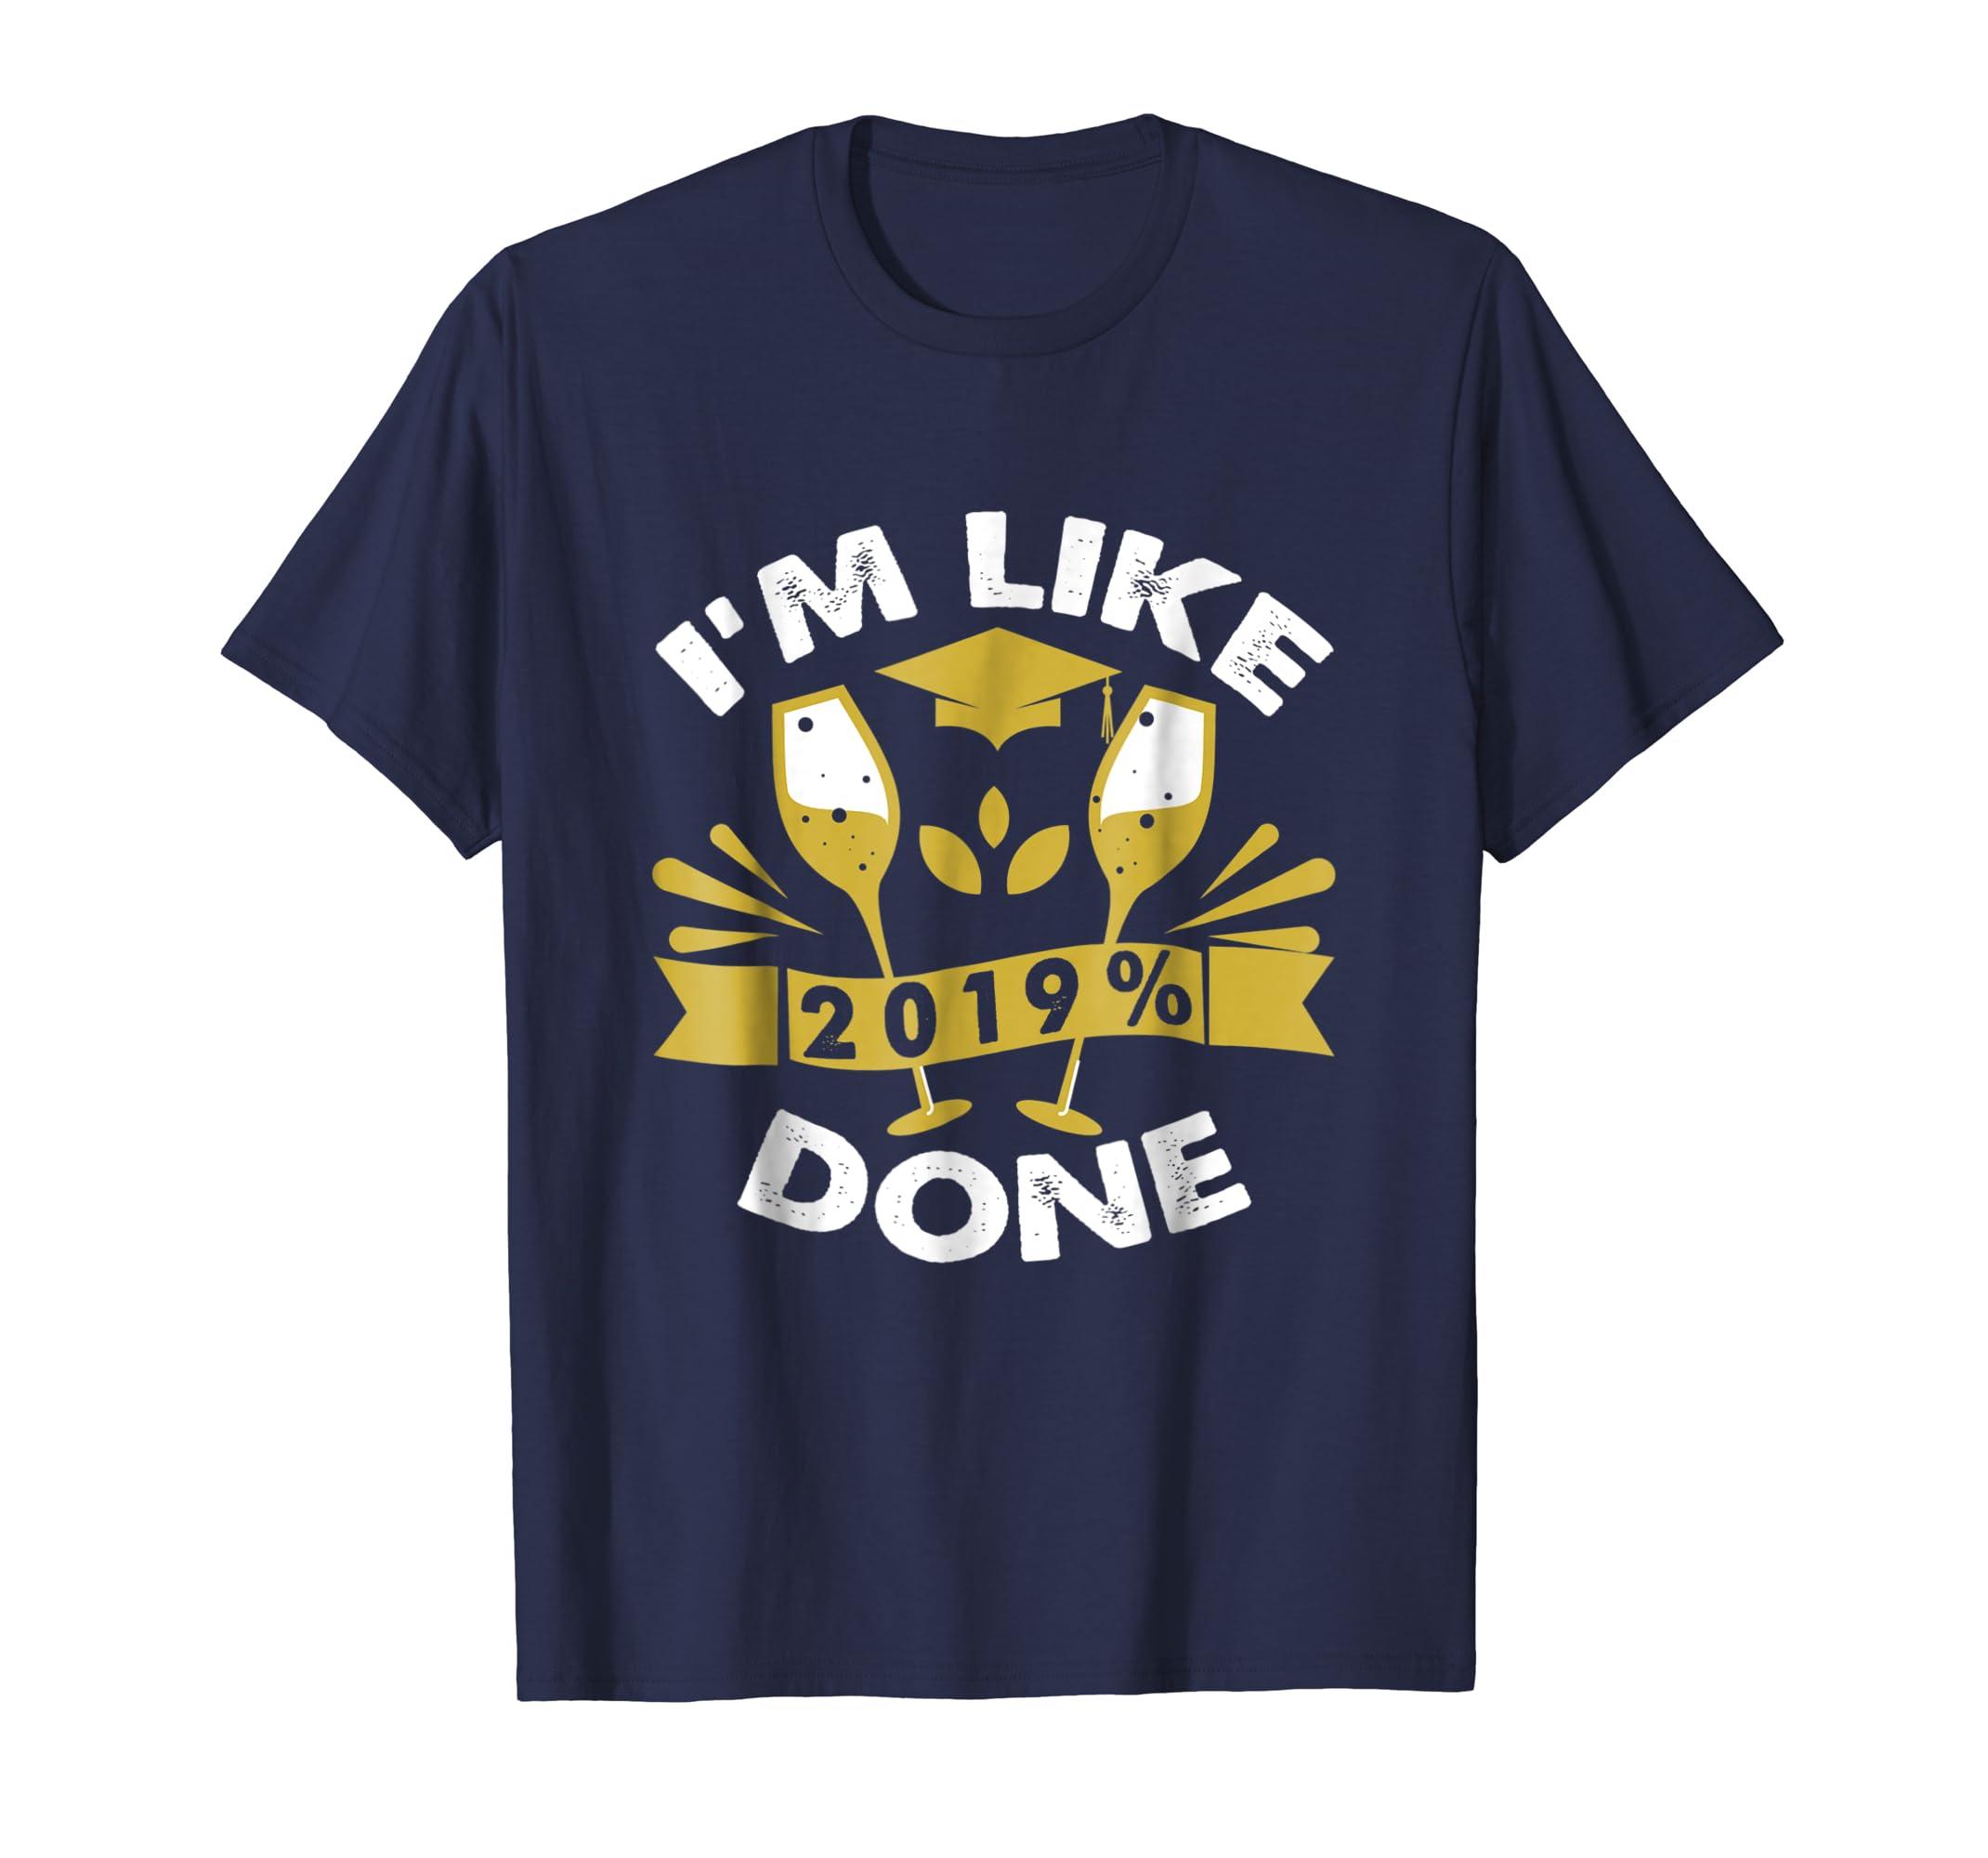 2019% Done High School Senior Graduation Gift Party tshirt-azvn